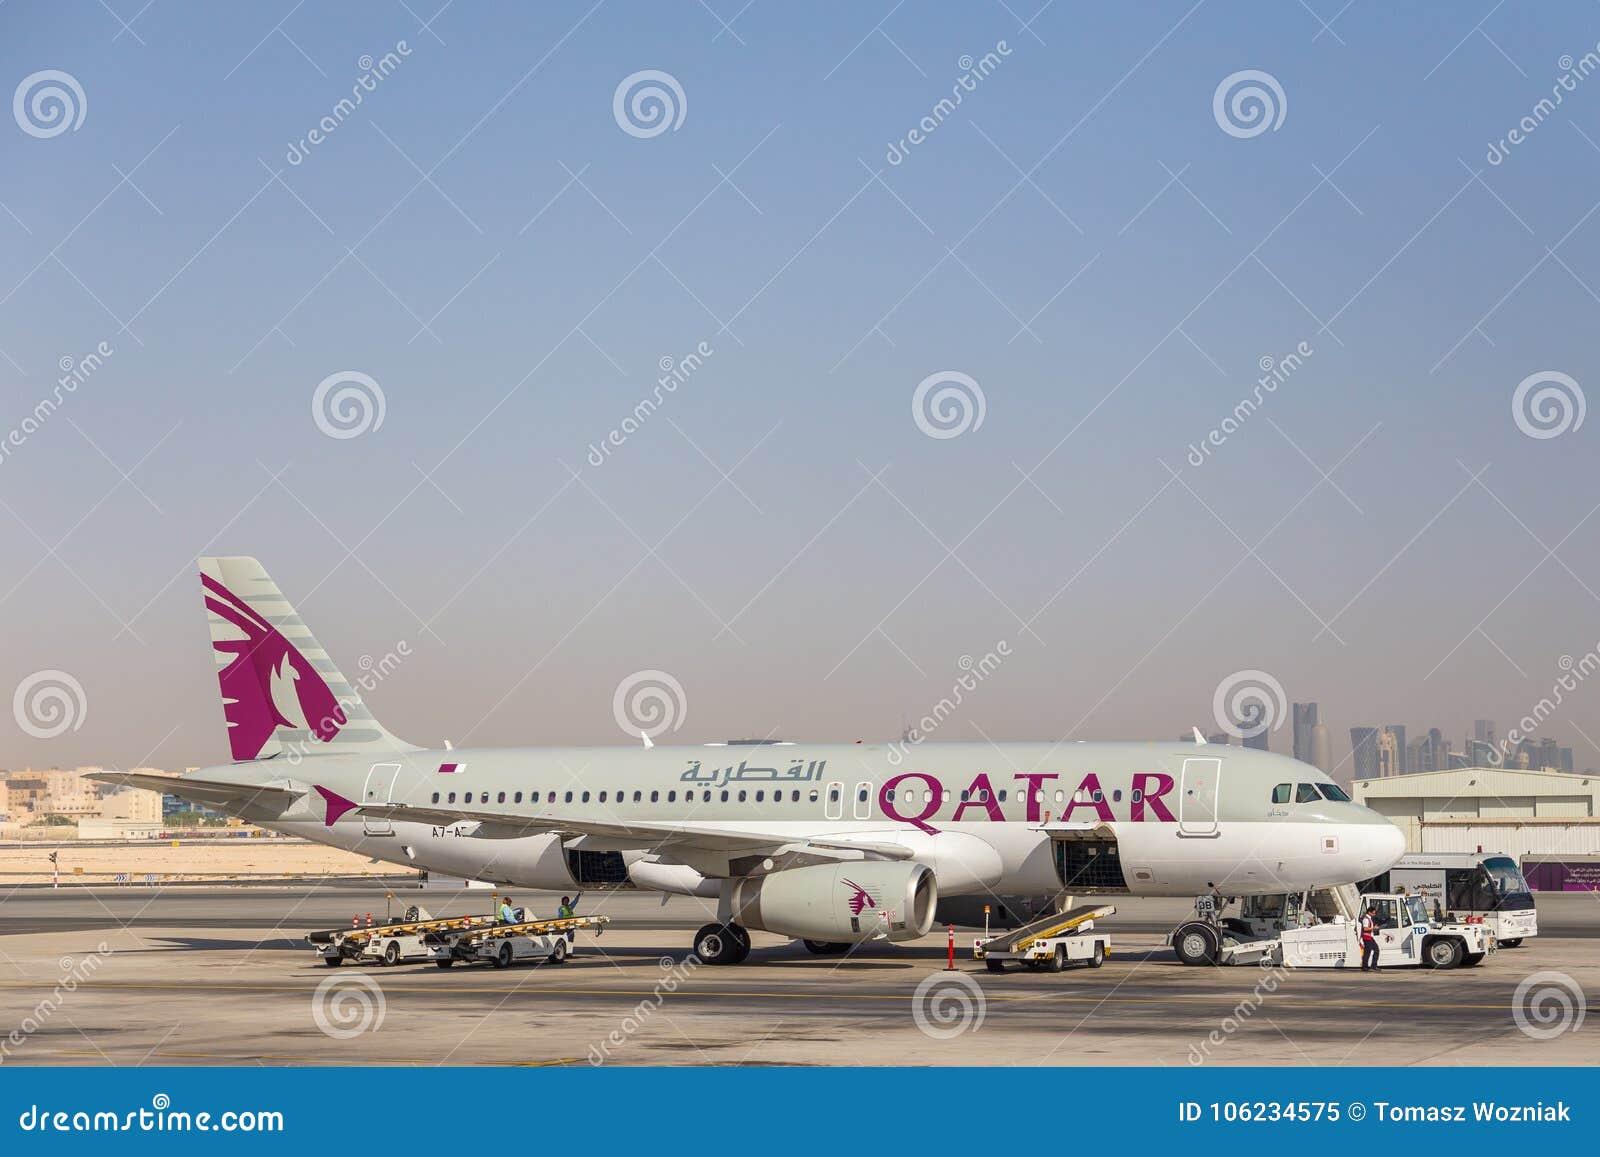 Airbus A320 of Qatar Airways